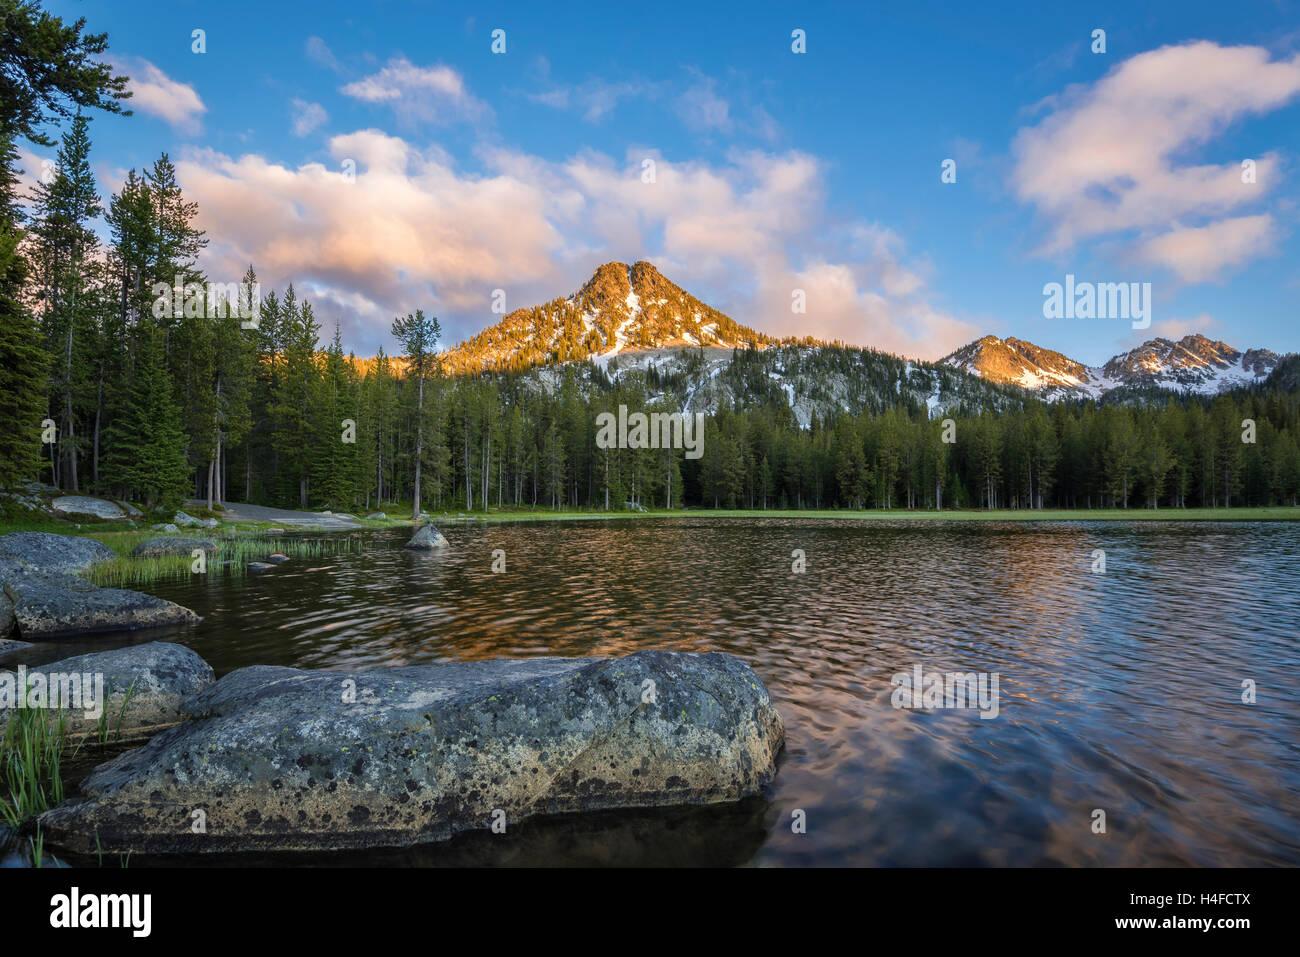 Anthony Lake und Visiereinrichtung Berg, Elkhorn Berge, Wallowa-Whitman National Forest, Ost-Oregon. Stockbild